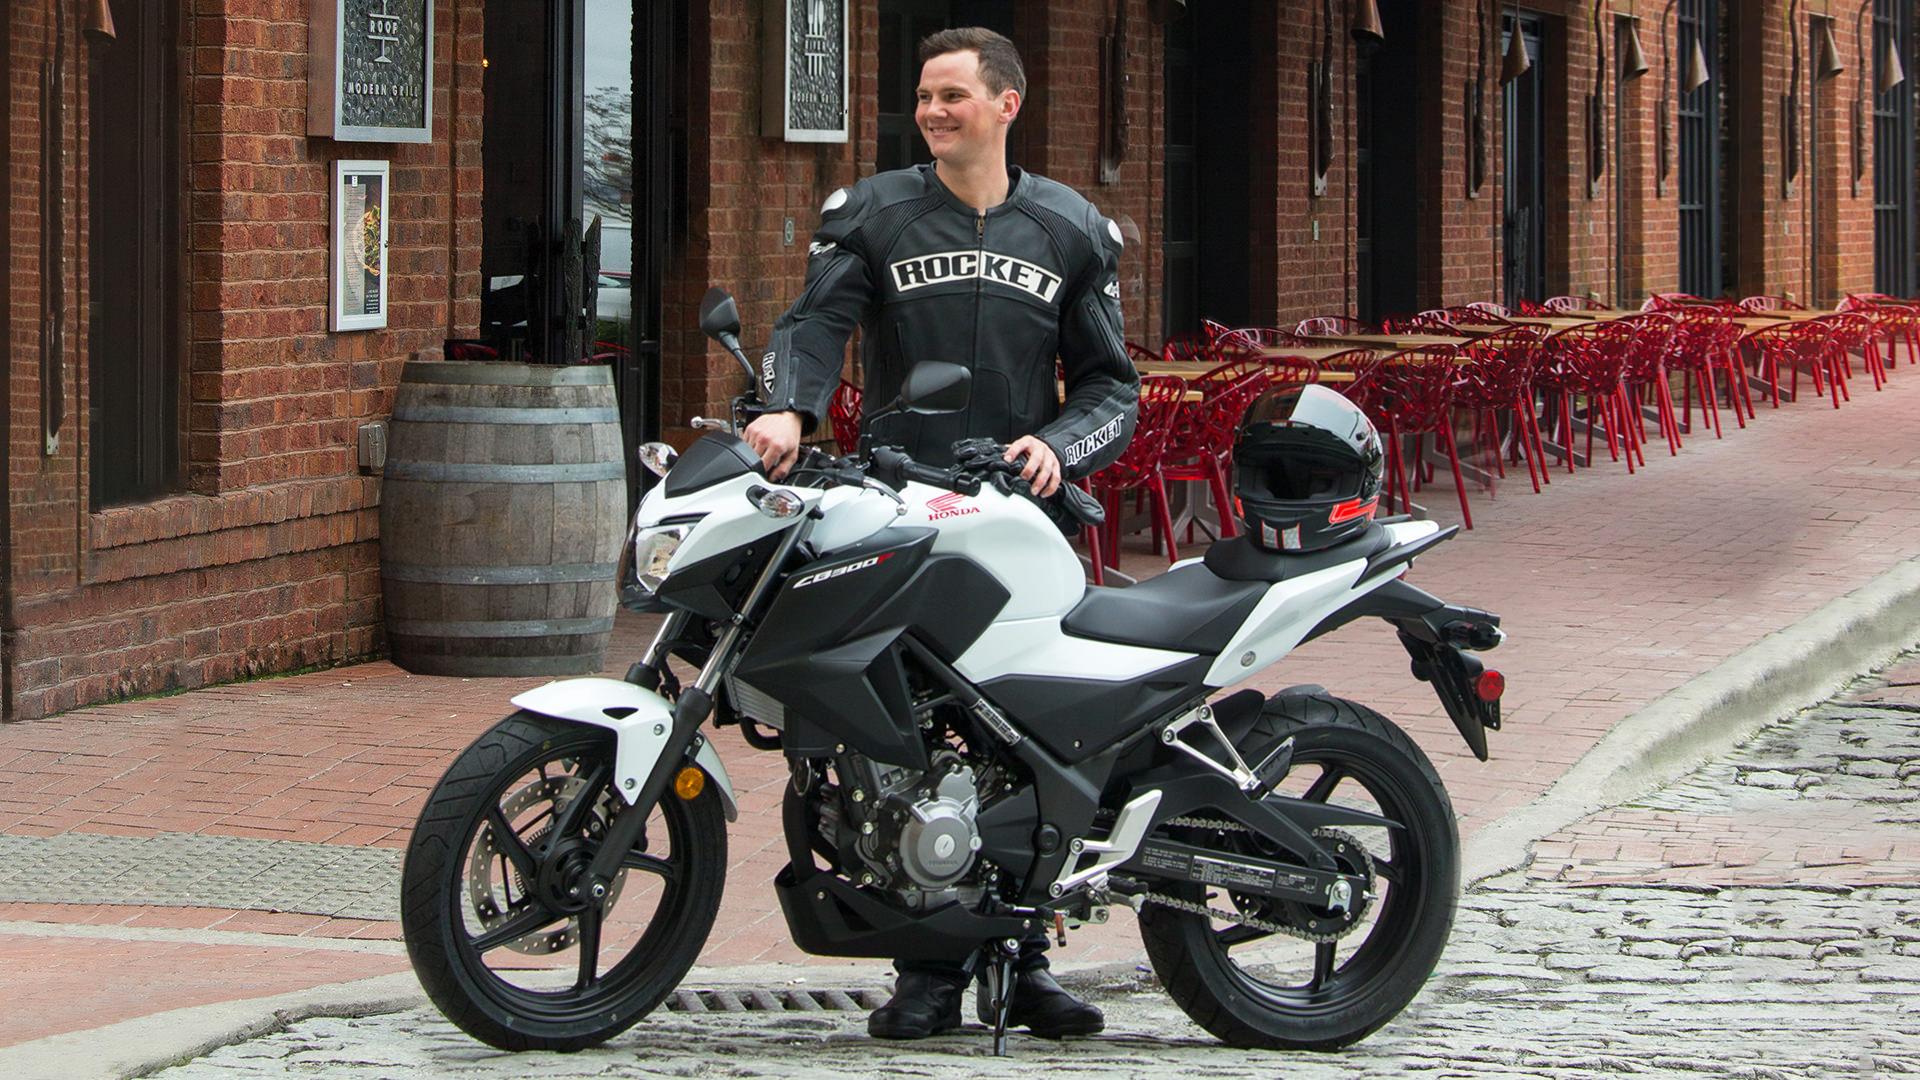 Honda Cb300f Reviw Specs Naked Cbr Motorcycle Bike Streetfighter Cbr300r Cb300 Cbr300 11